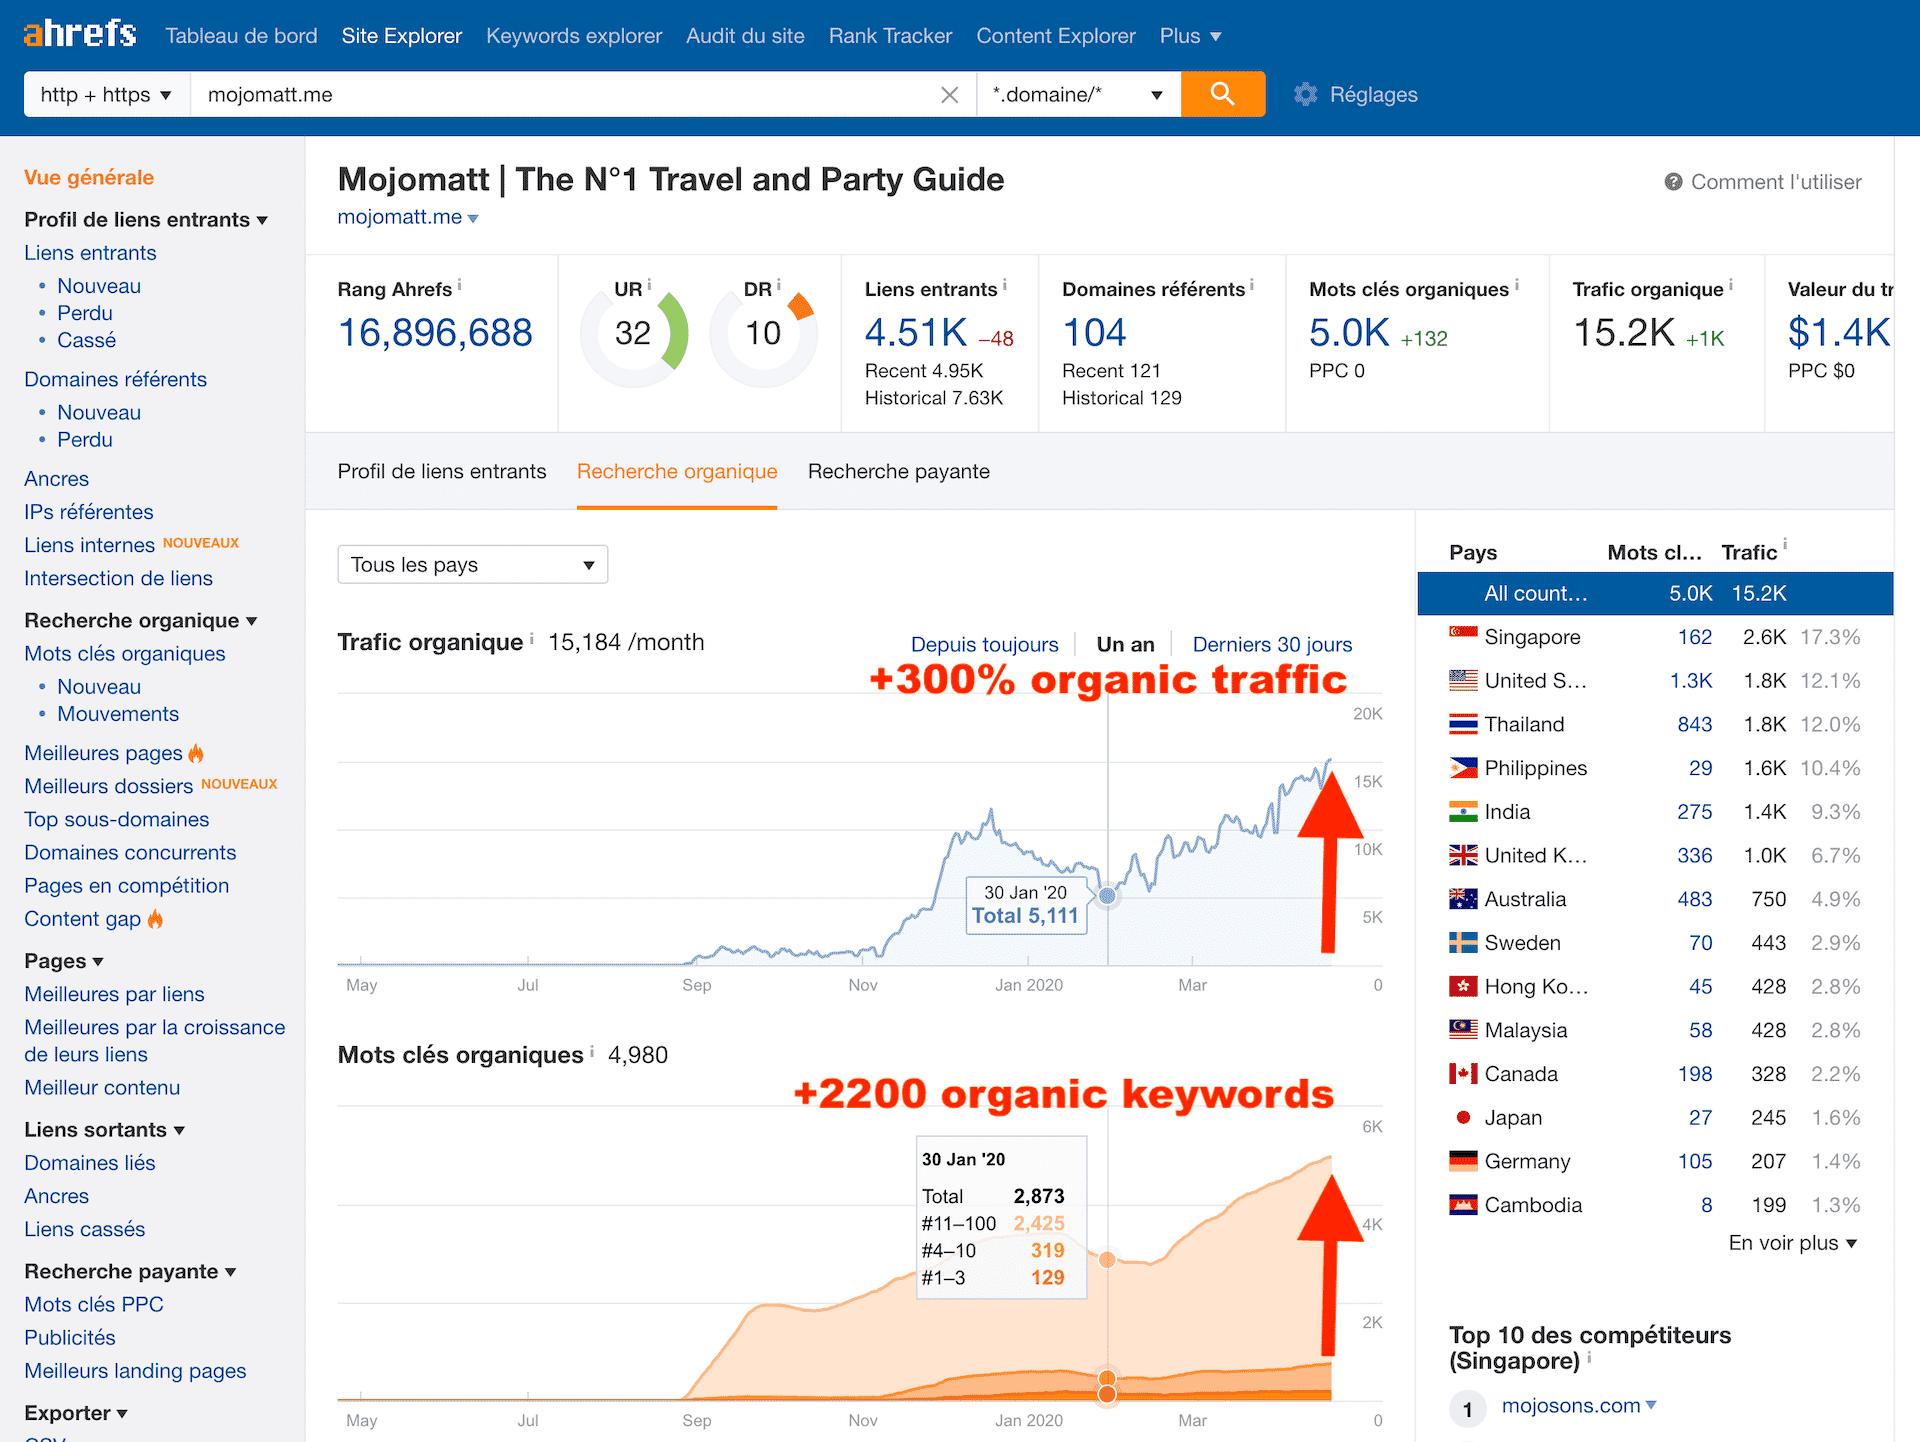 mojomatt.me case study 2020 ahrefs organic trafic overview